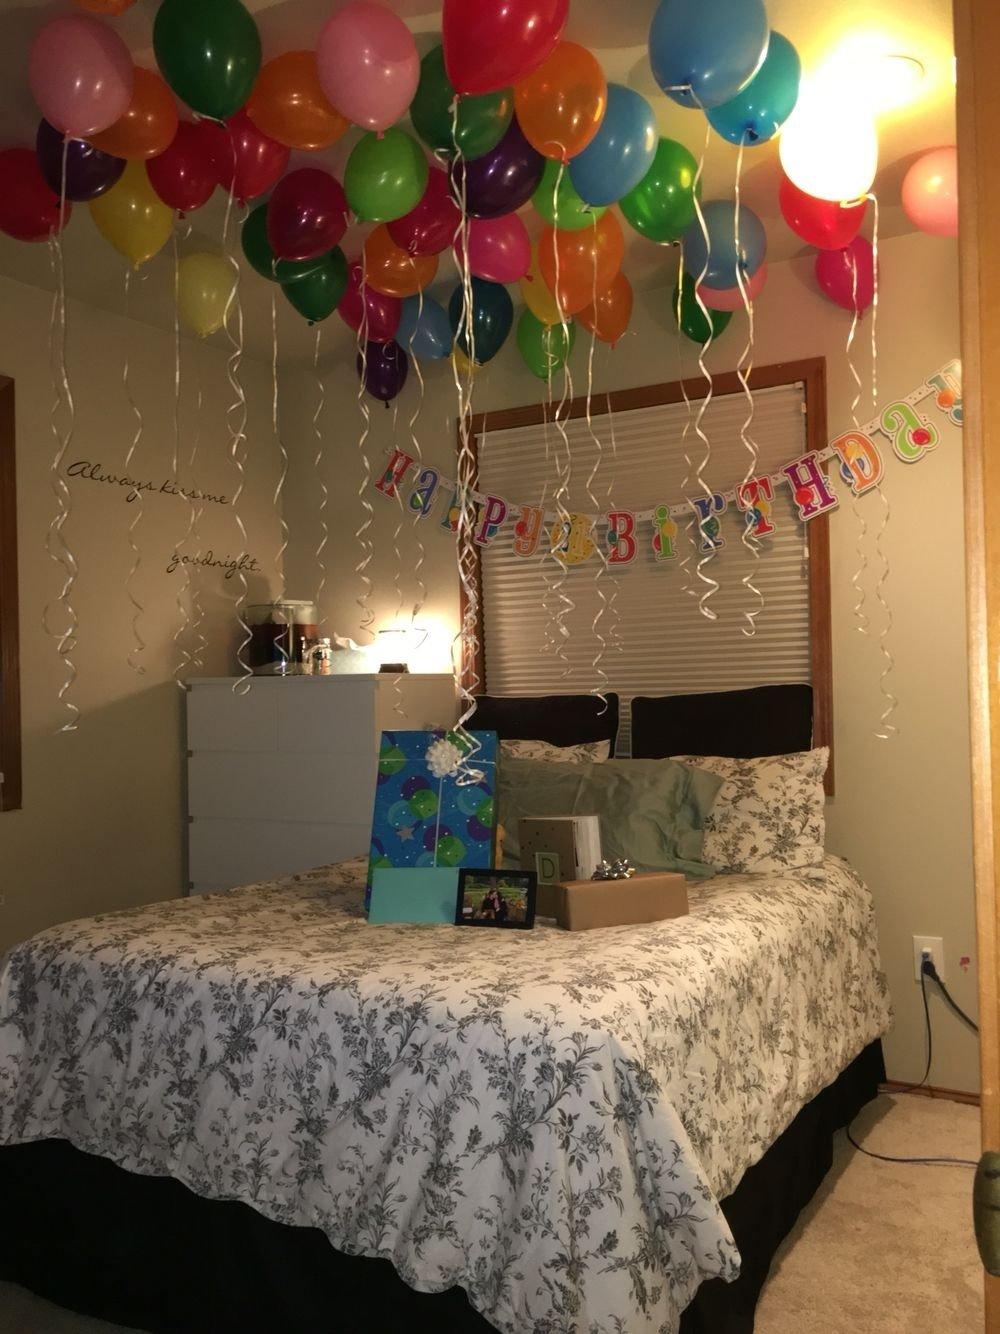 10 Stylish Surprise Birthday Ideas For Boyfriend birthday surprise for boyfriend since im not 21 yet we couldnt go 5 2020